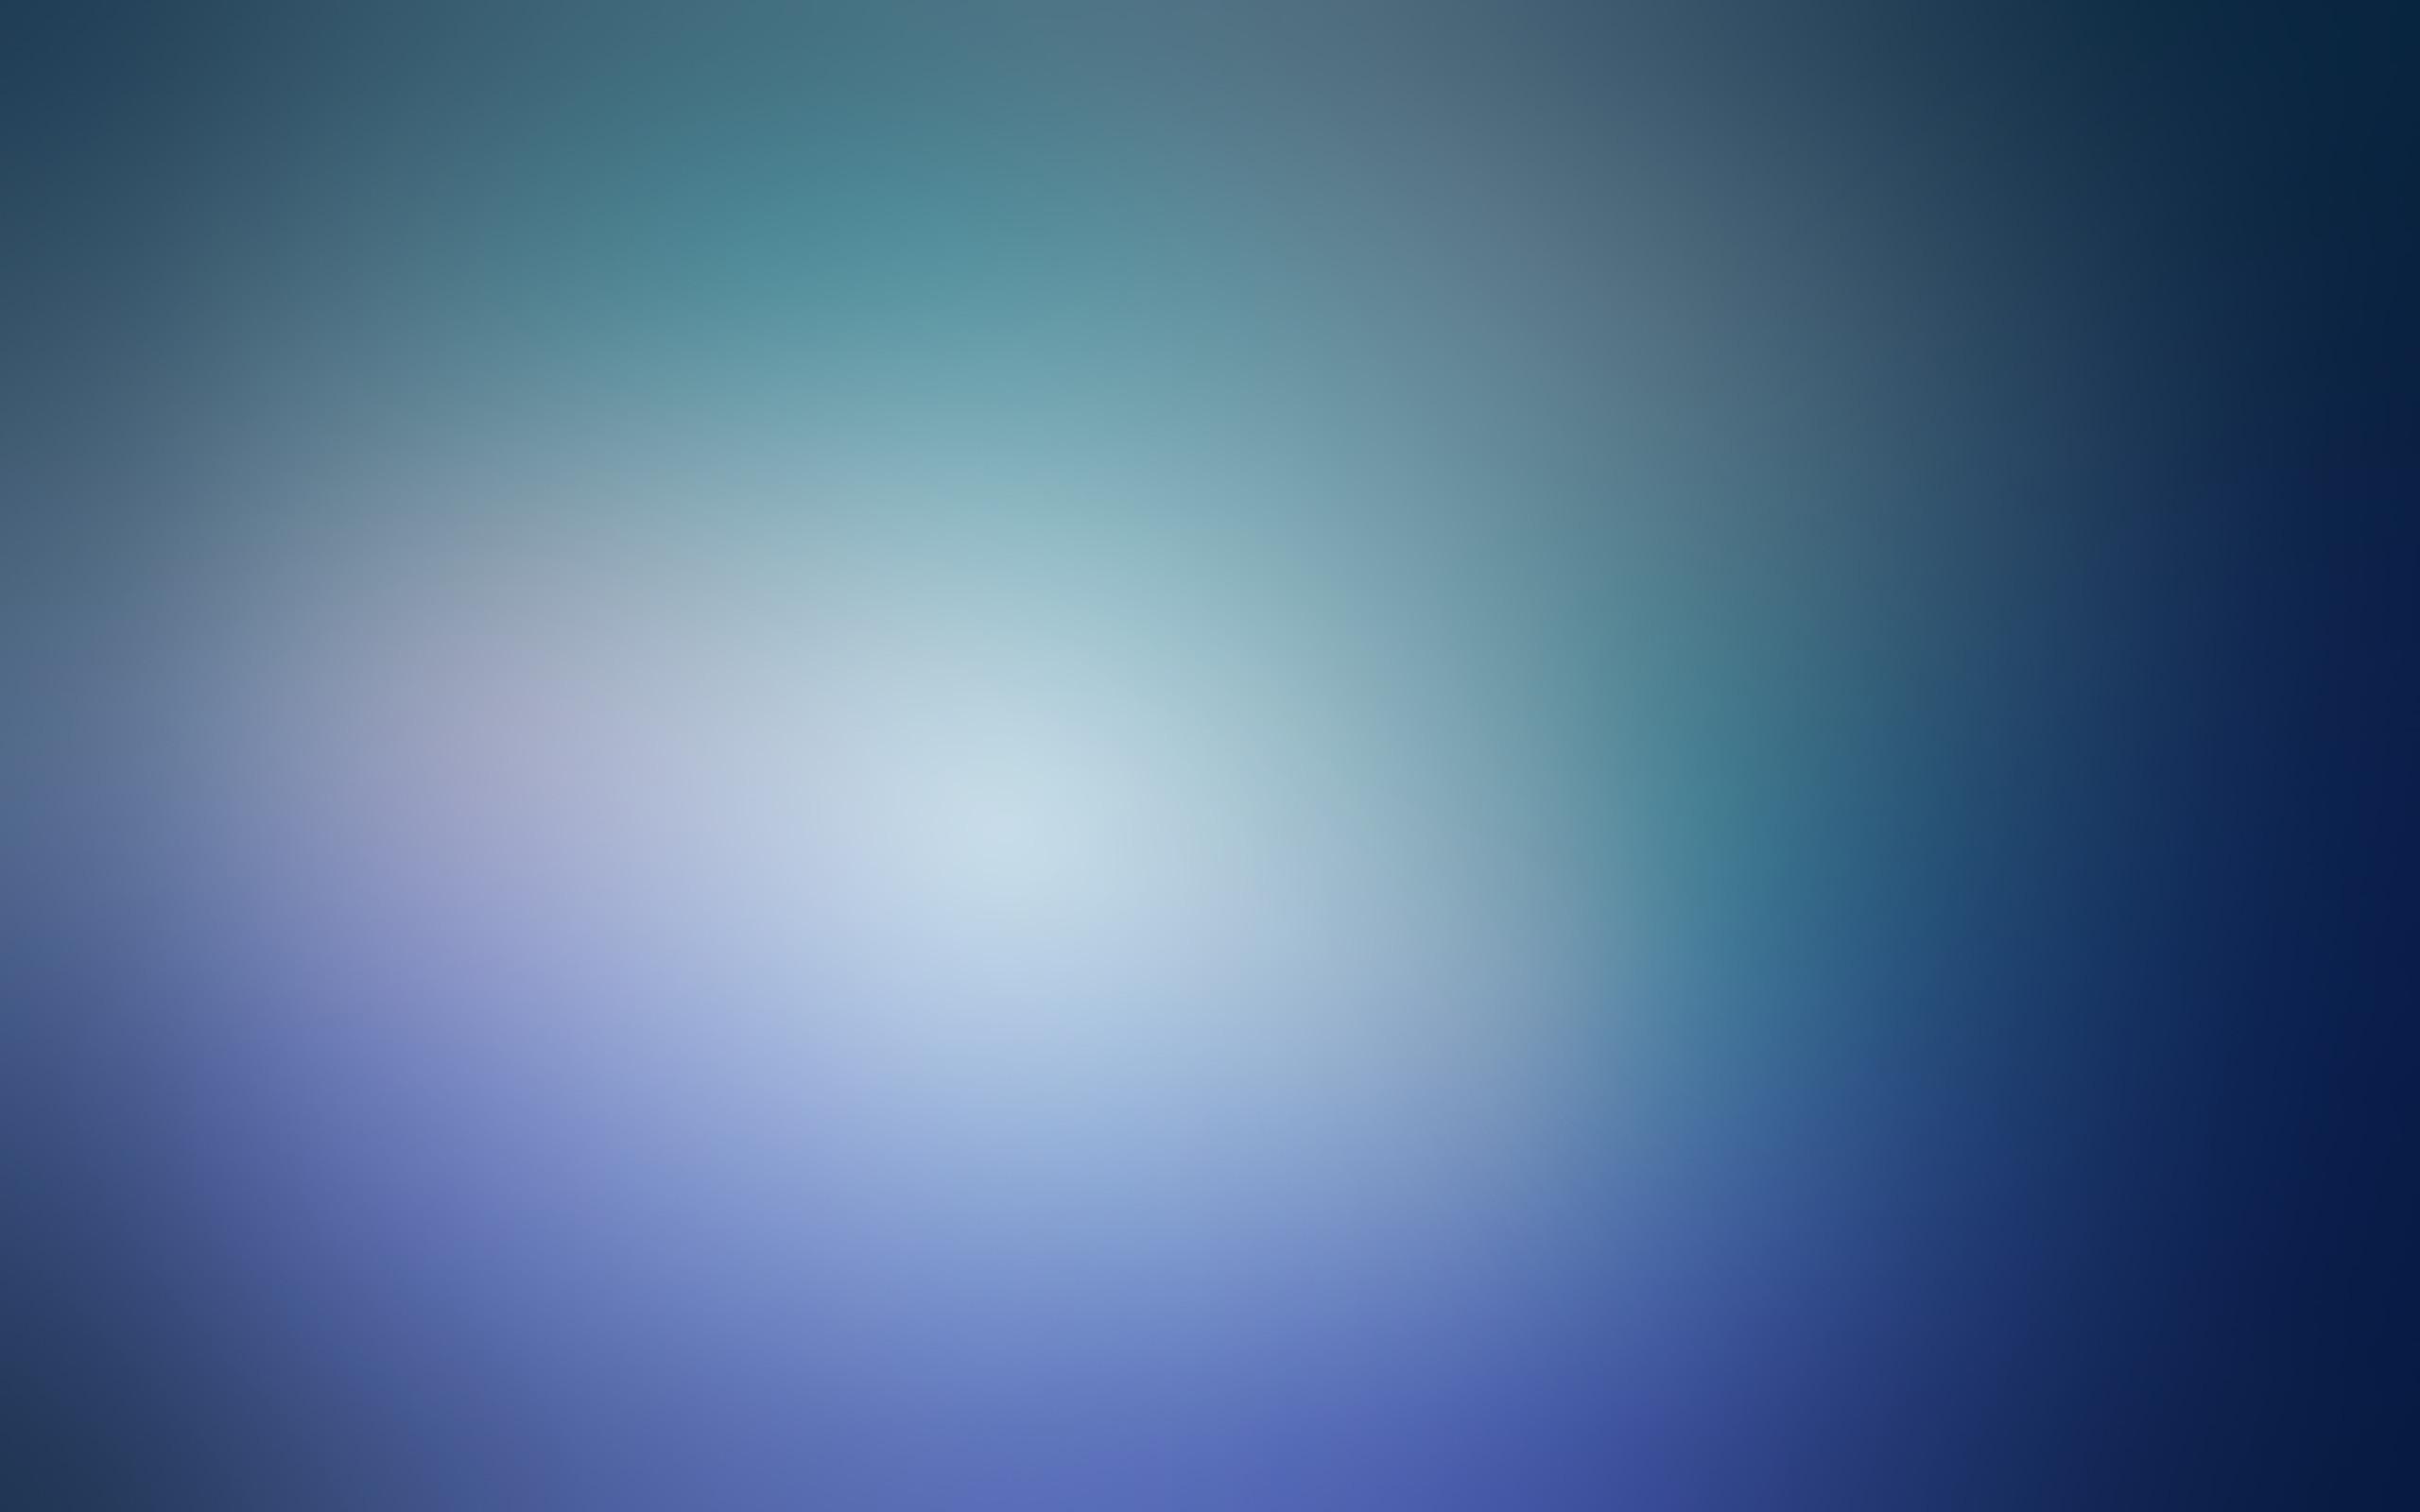 Blue Gradient Wallpapers – Wallpaper Cave